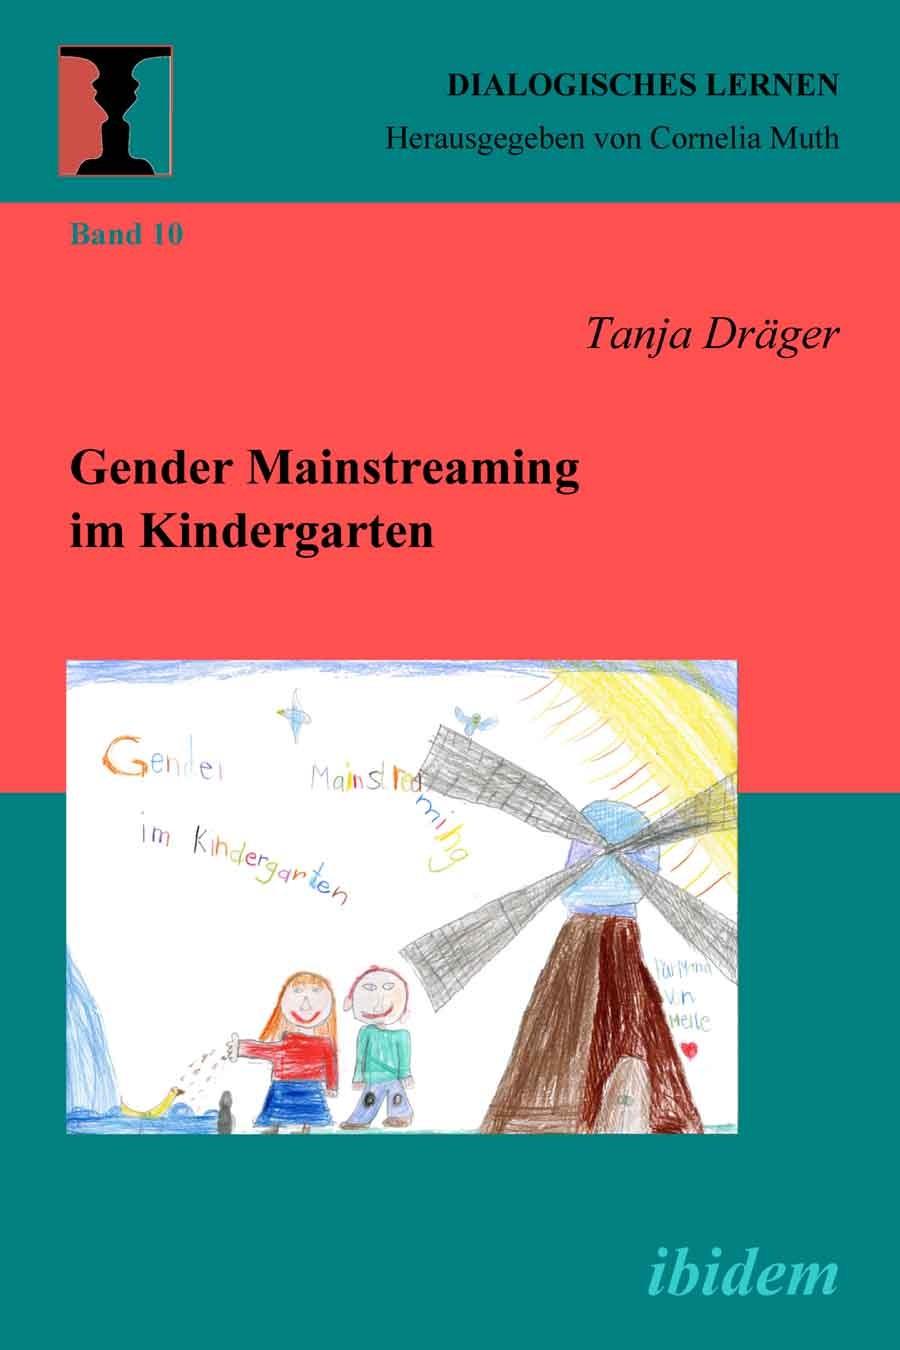 Gender Mainstreaming im Kindergarten